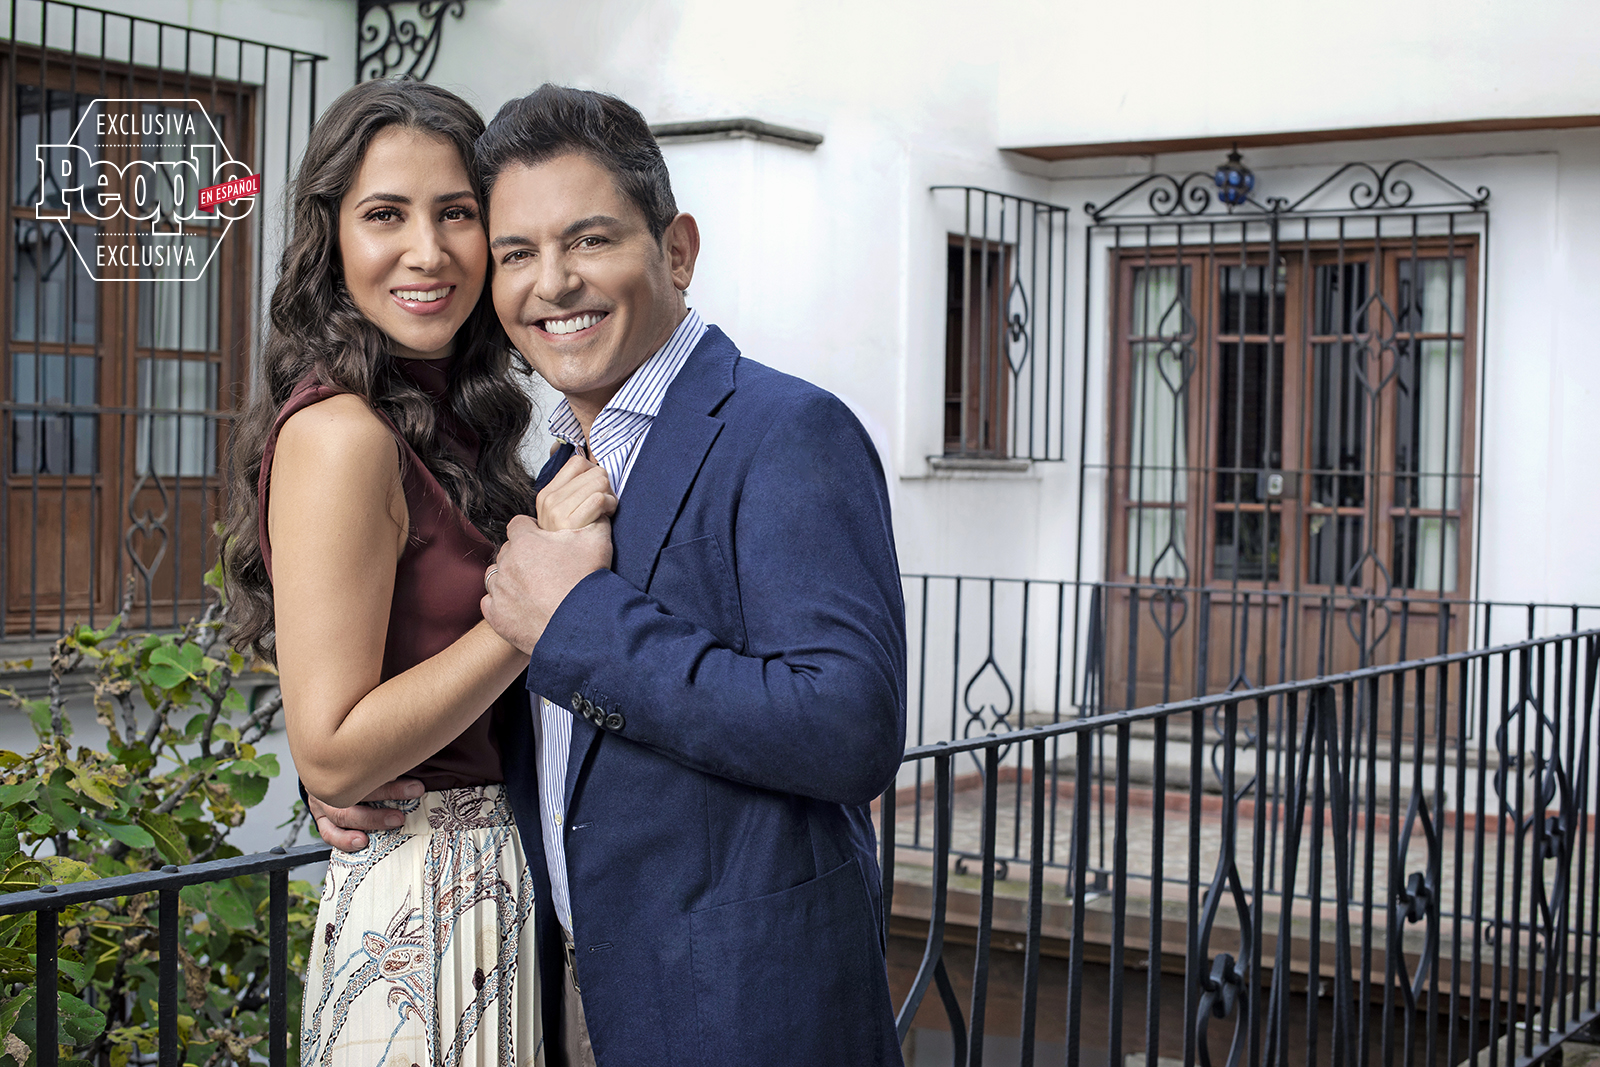 Patricia Rodriguez Es La Esposa De Ernesto Laguardia